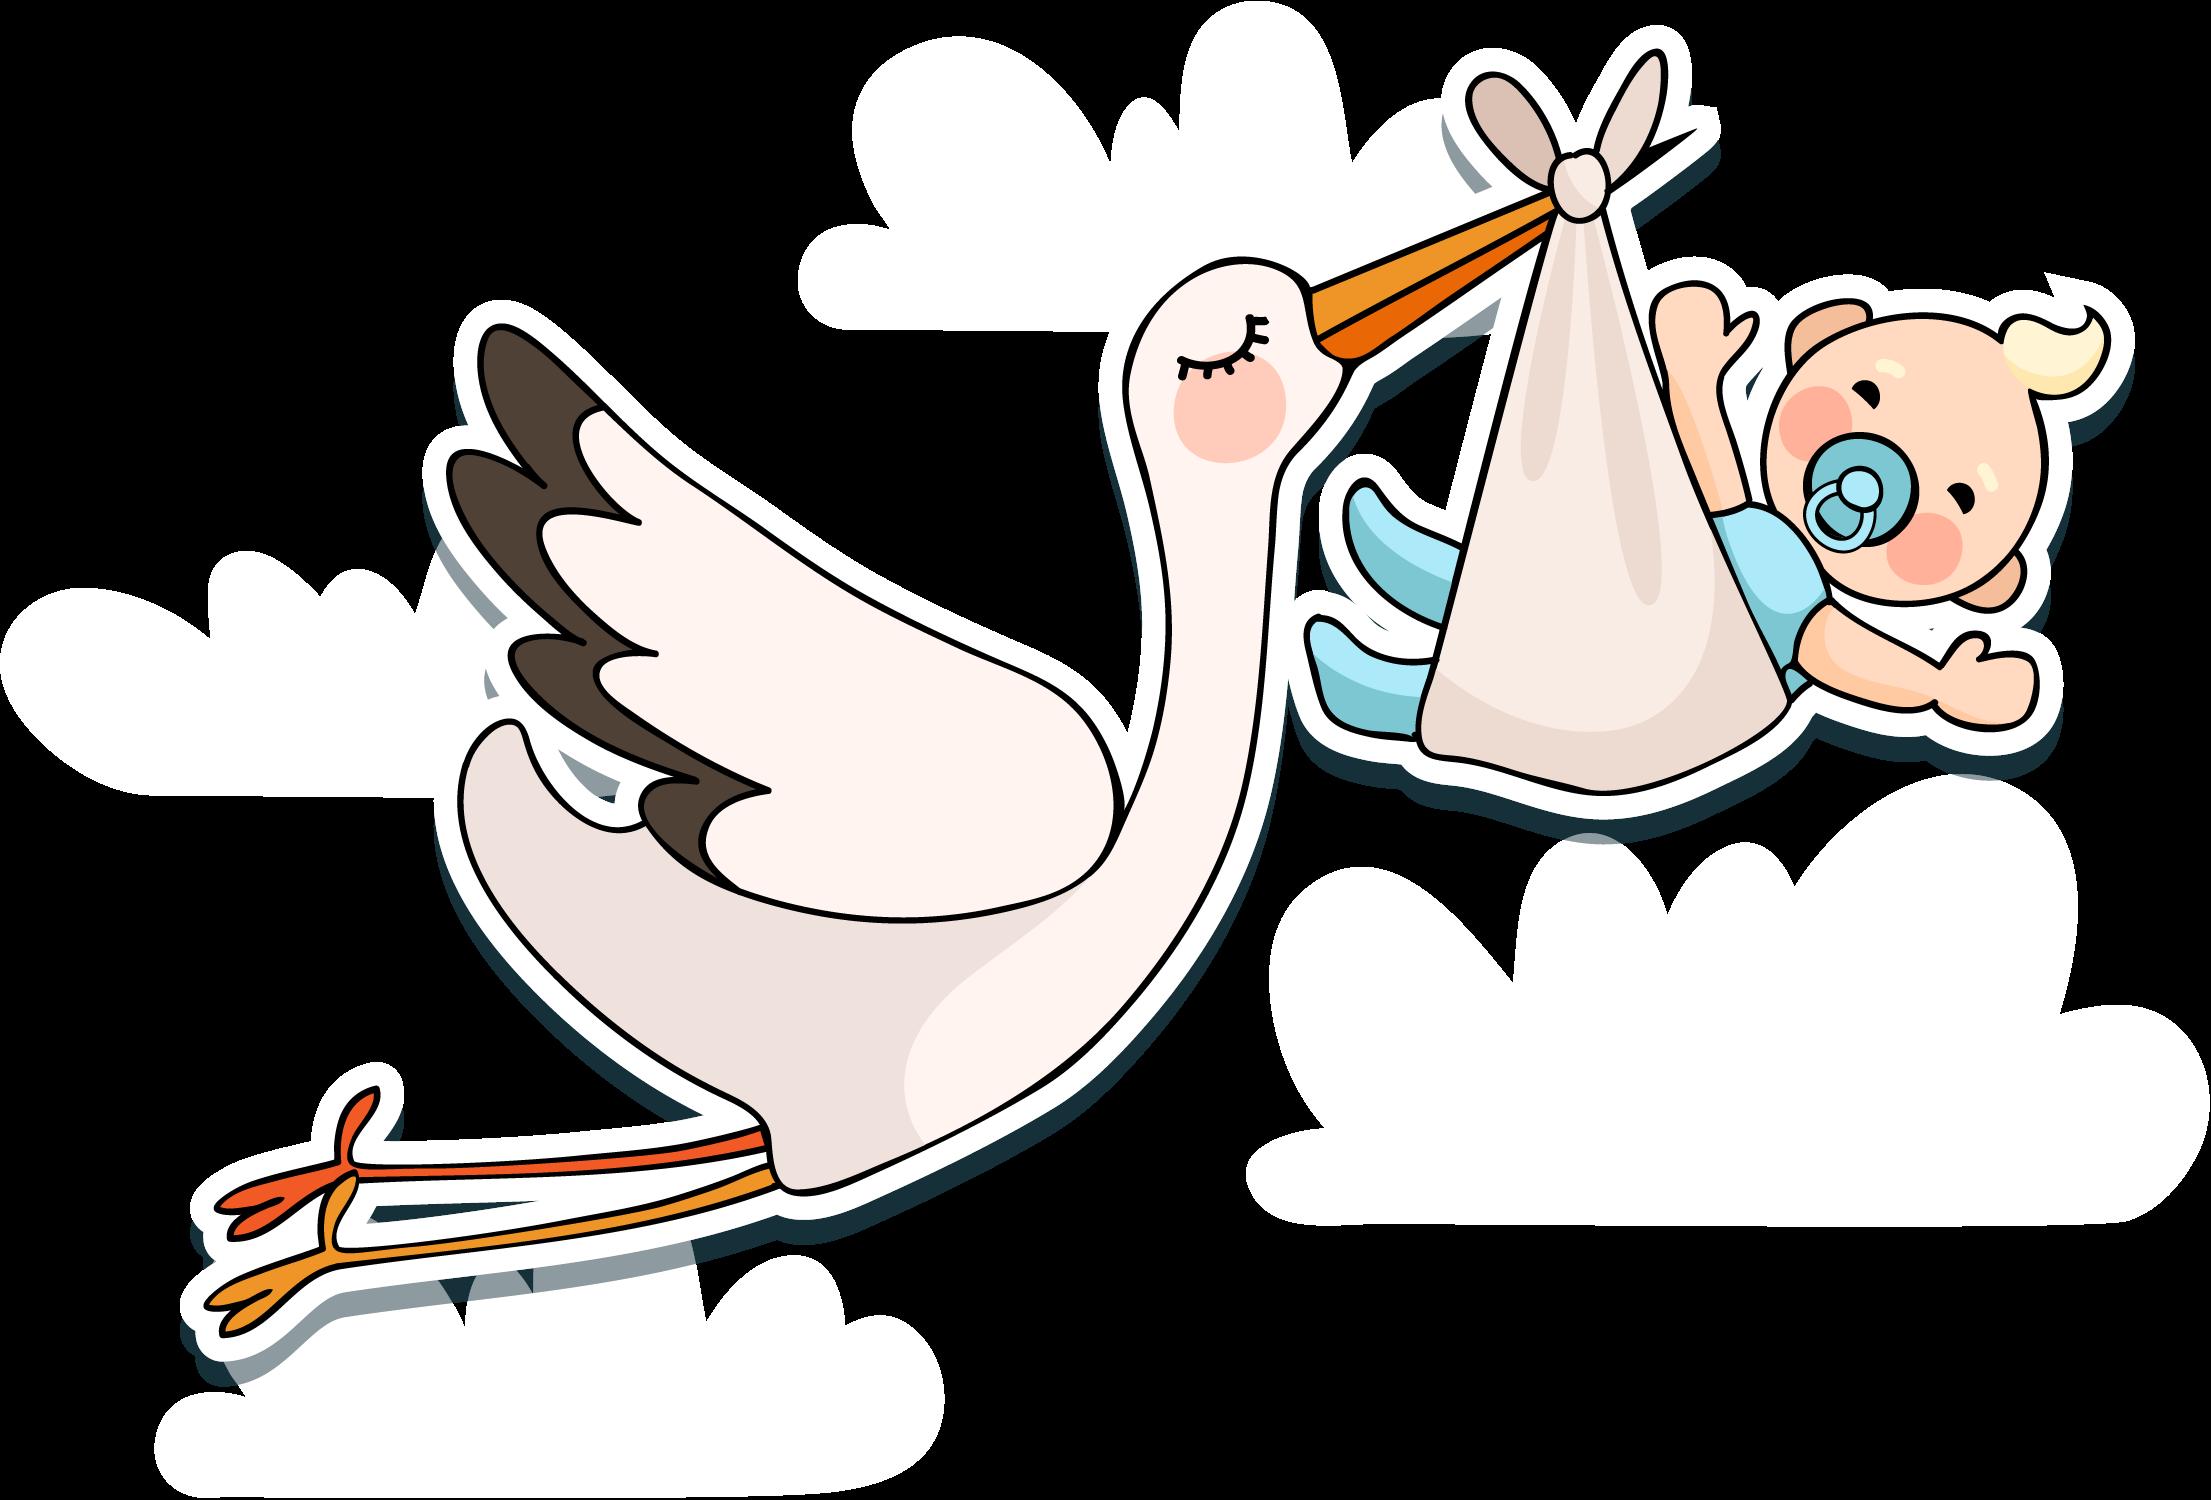 White stork infant baby. Pelican clipart vector